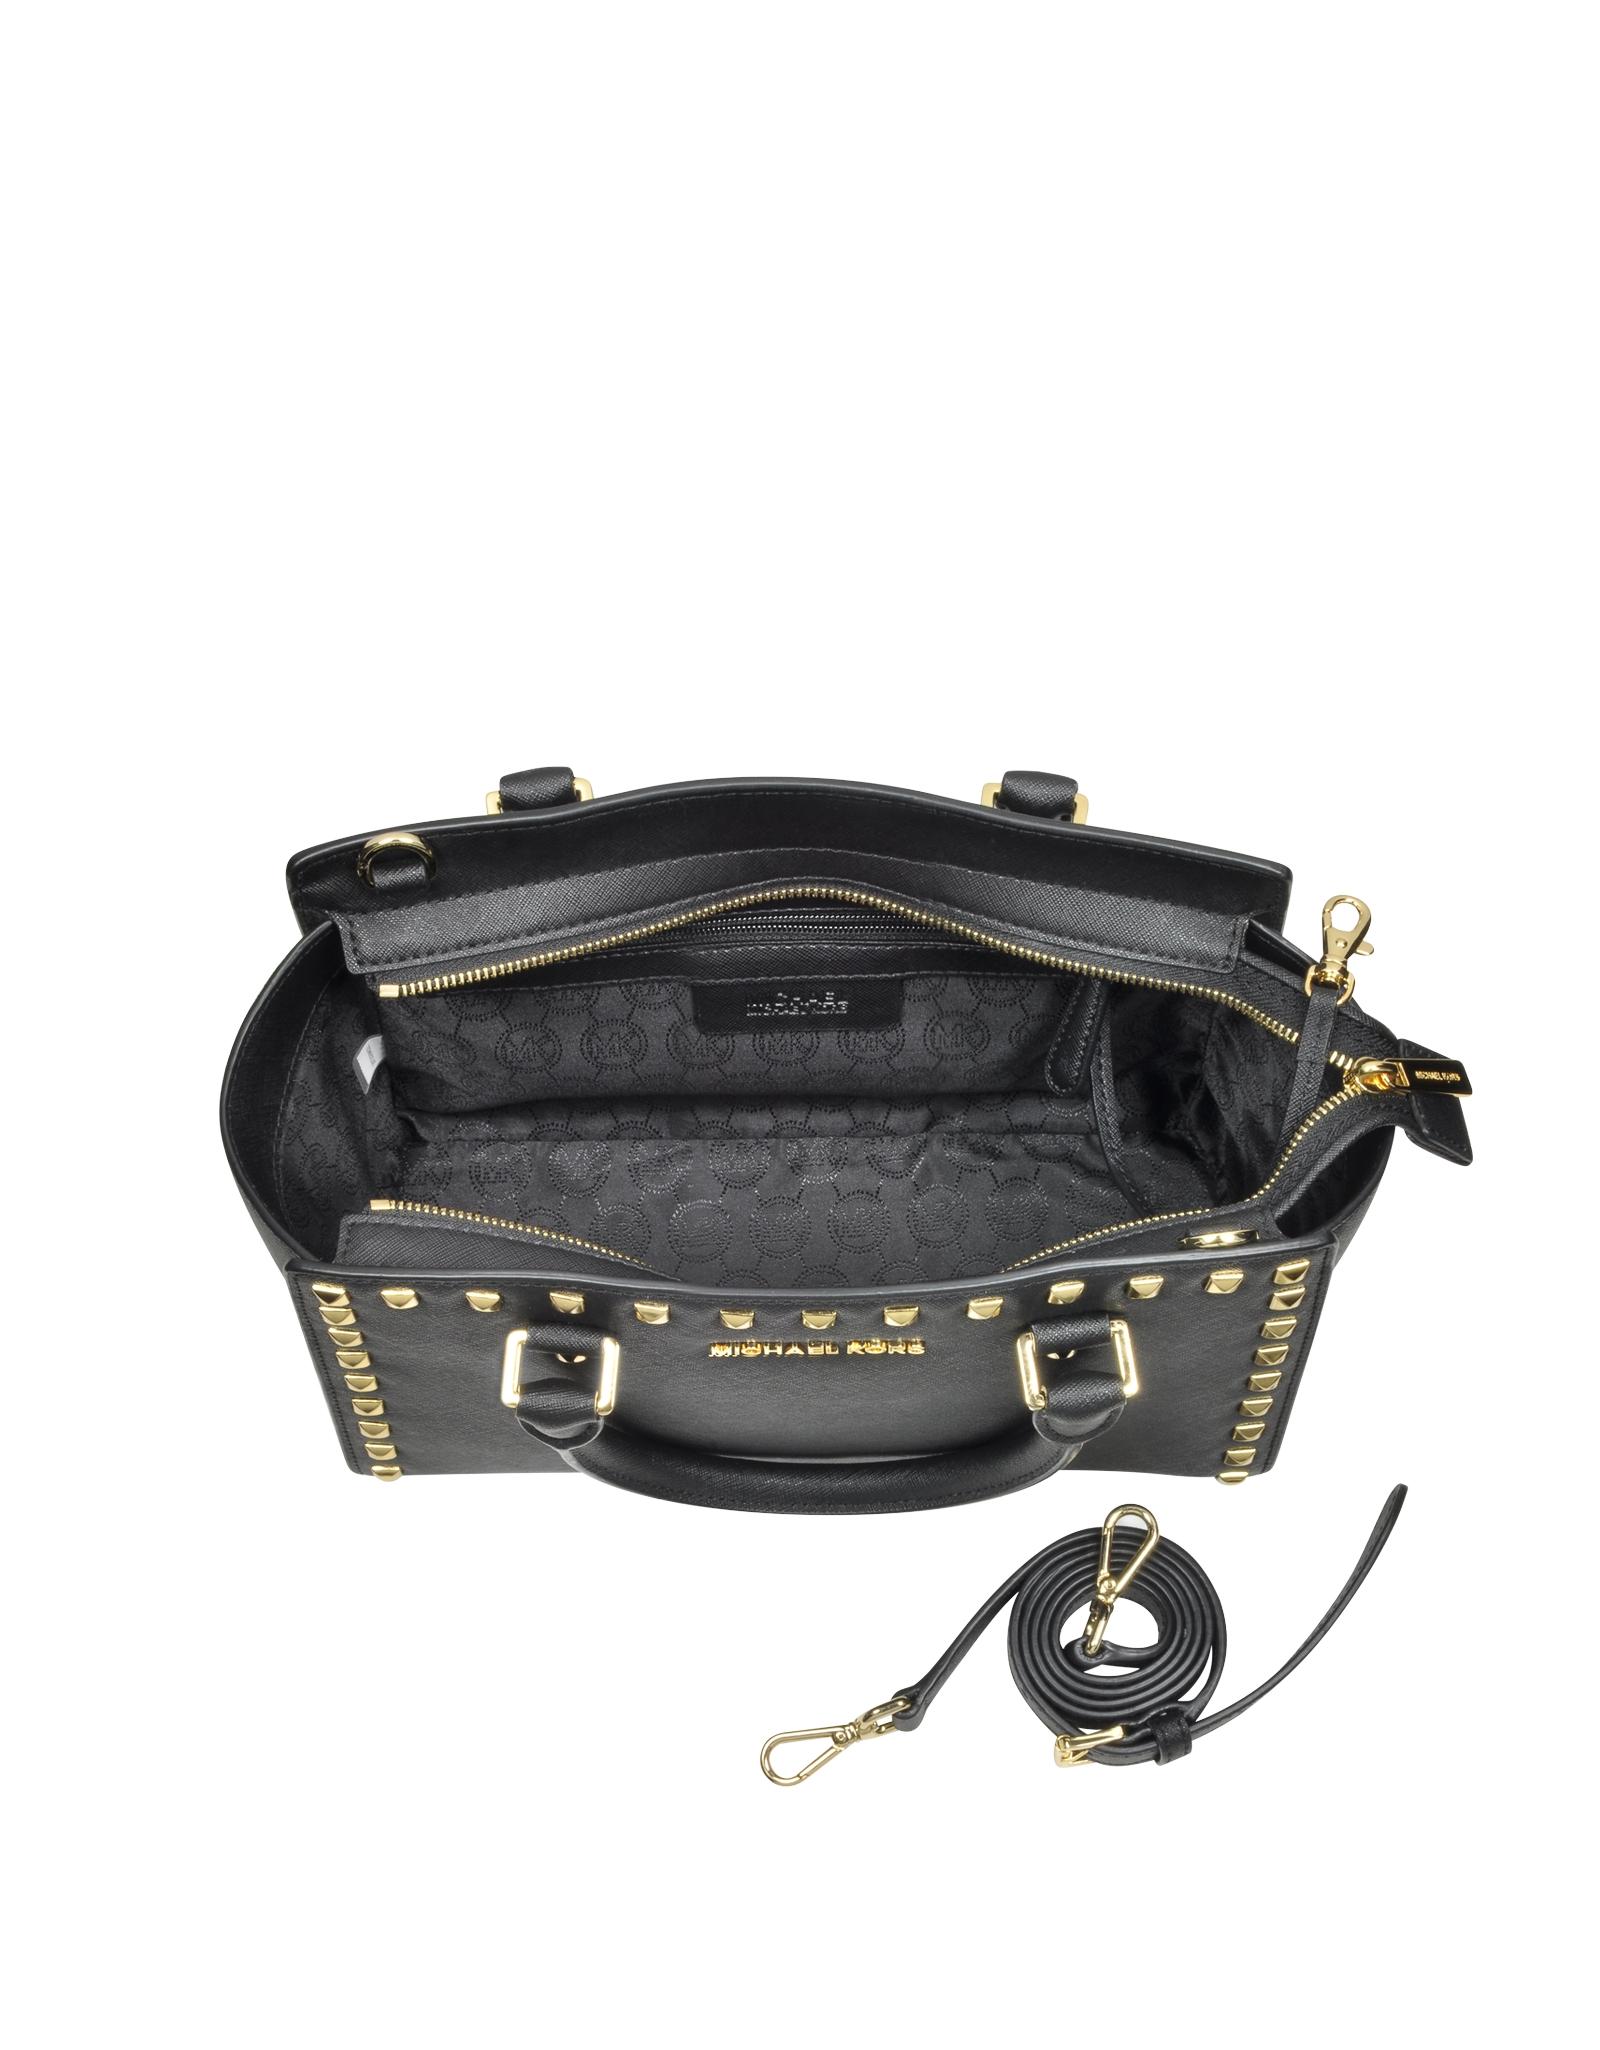 ba3b31a5faf0 Lyst - Michael Kors Selma Medium Studded Black Saffiano Leather Satchel in  Black